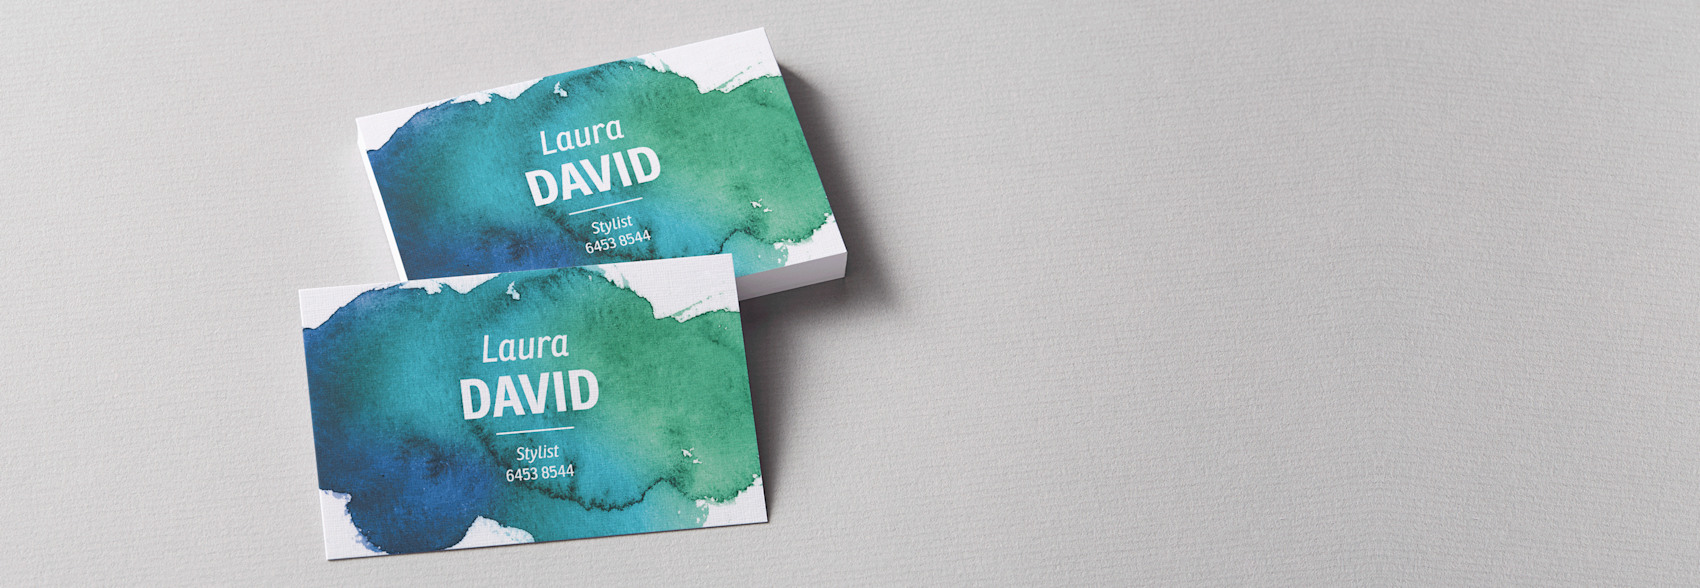 Name card printing online